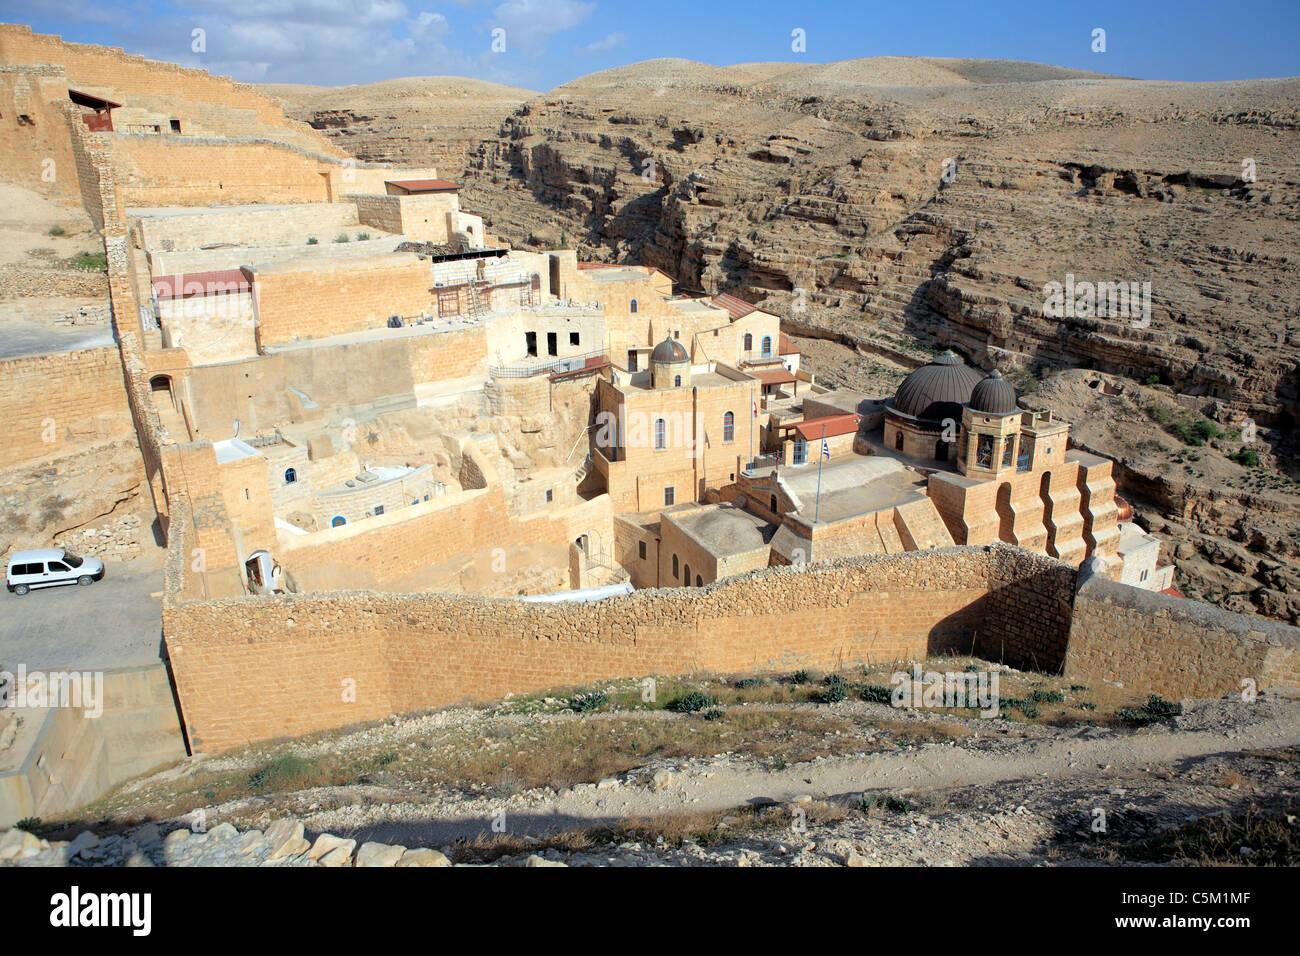 Greek orthodox monastery of St. Saba, Mar Saba, Israel - Stock Image